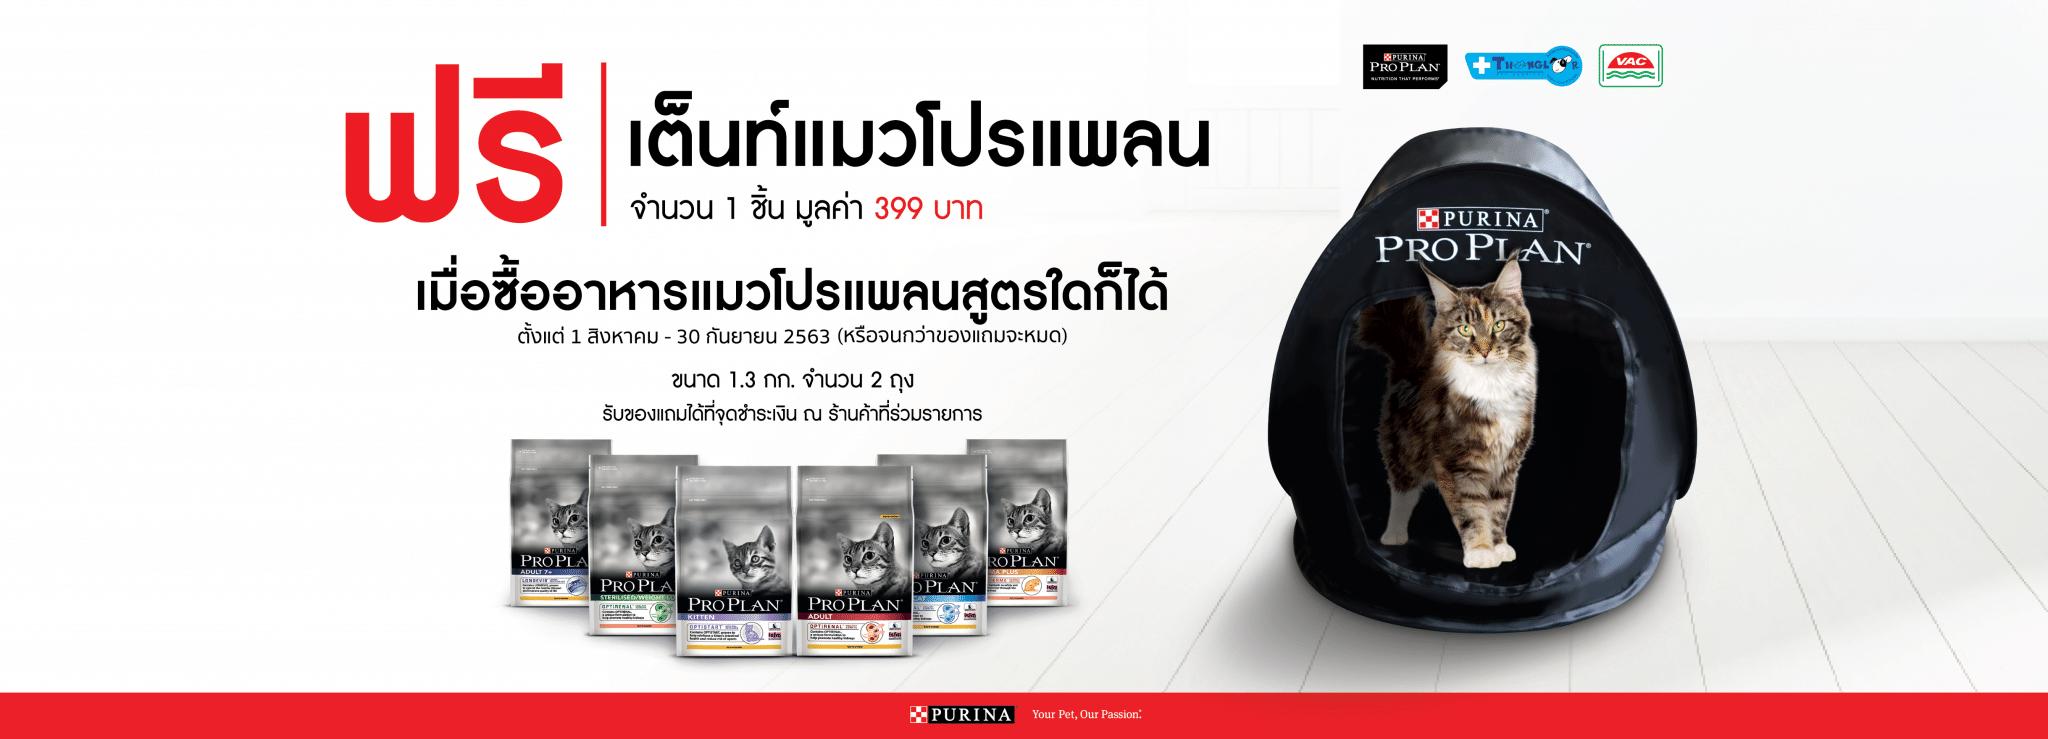 PP ads02 |